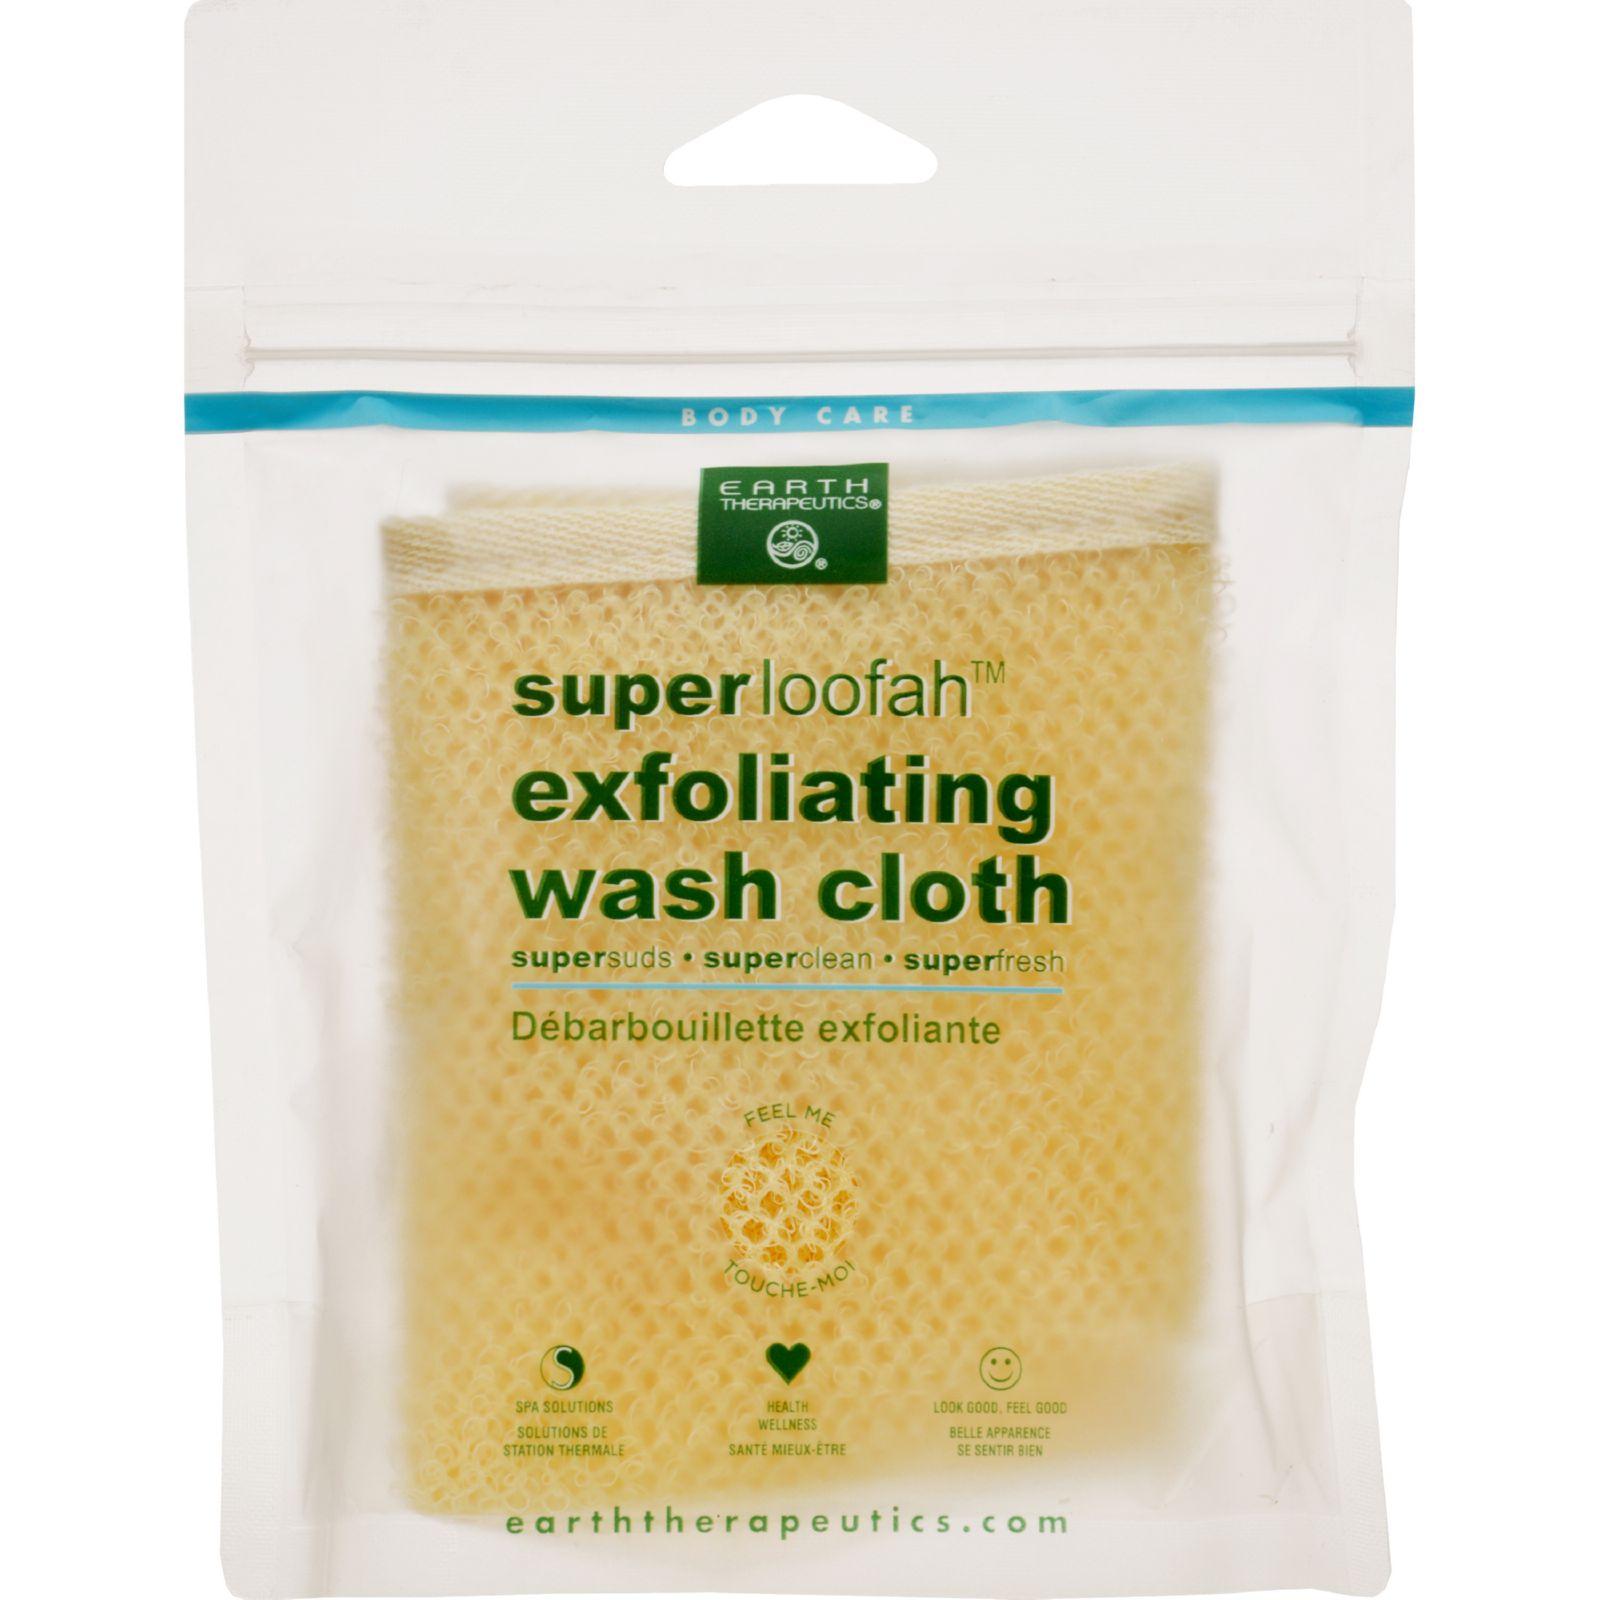 Earth Therapeutics Loofah - Super - Exfoliating - Wash Cloth - 1 Count